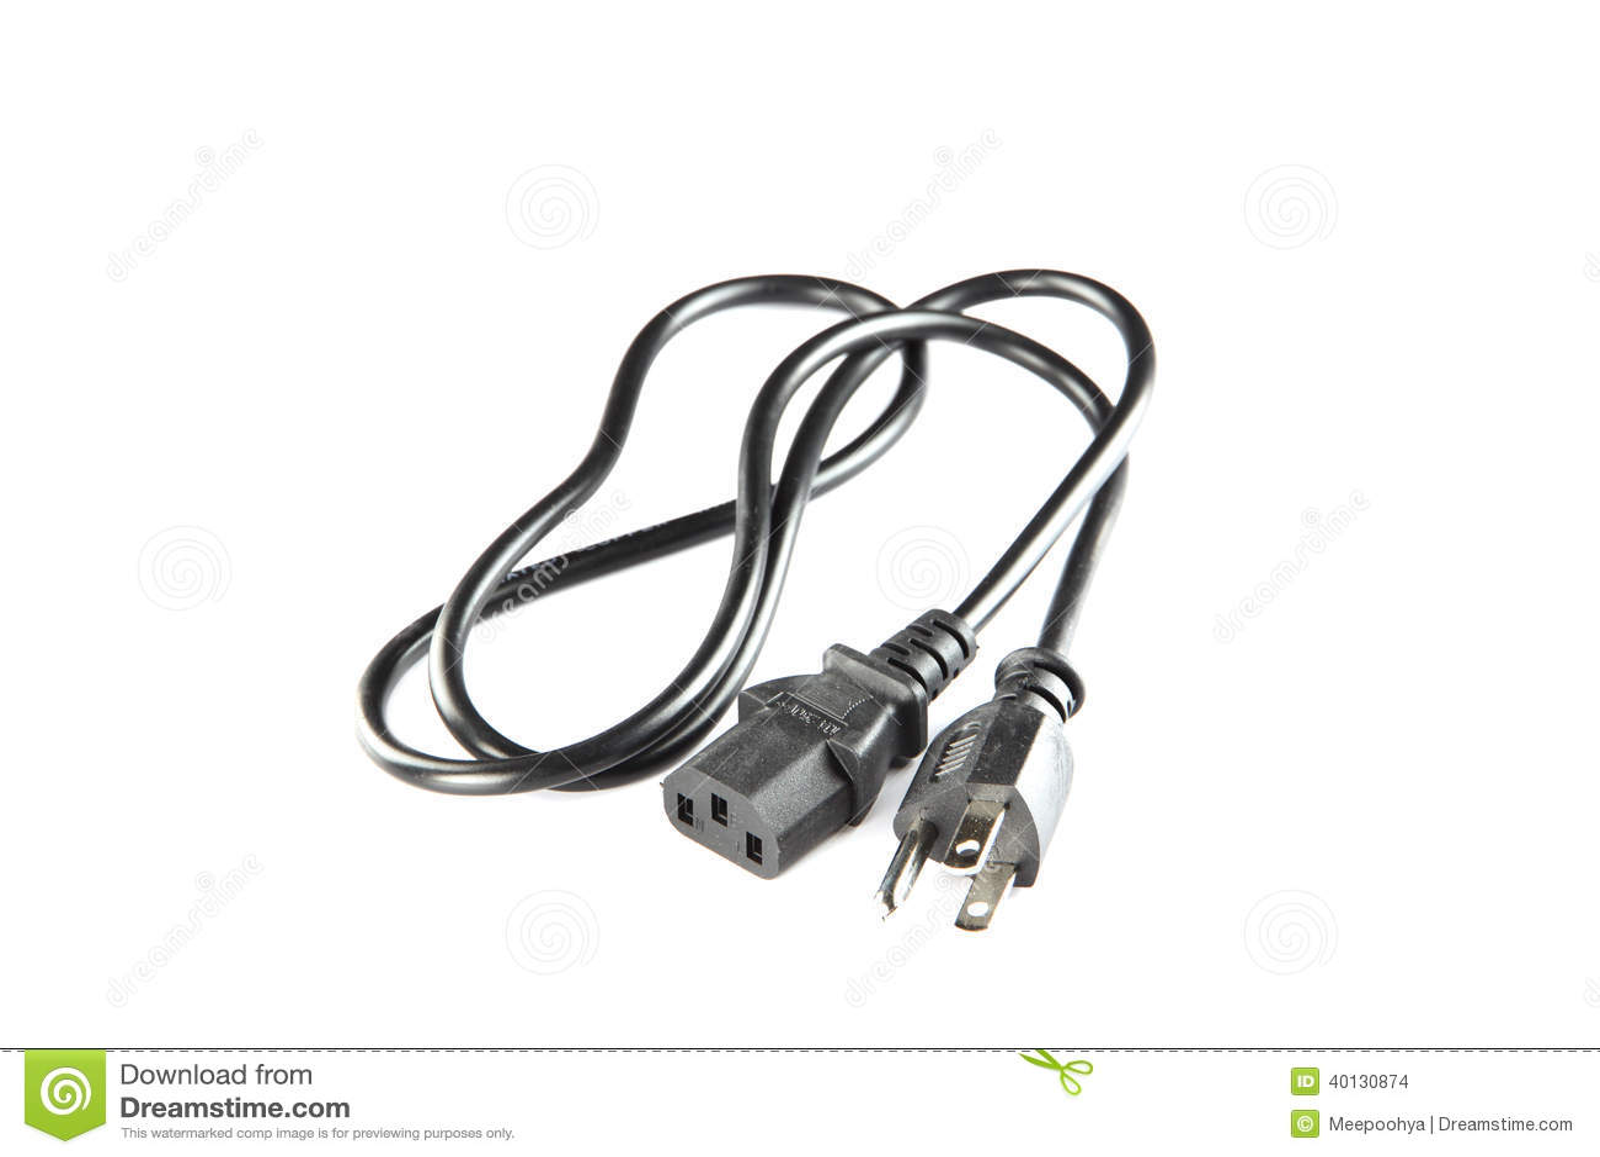 Cabo distribuidor de corrente preto da tomada e do soquete isolados.